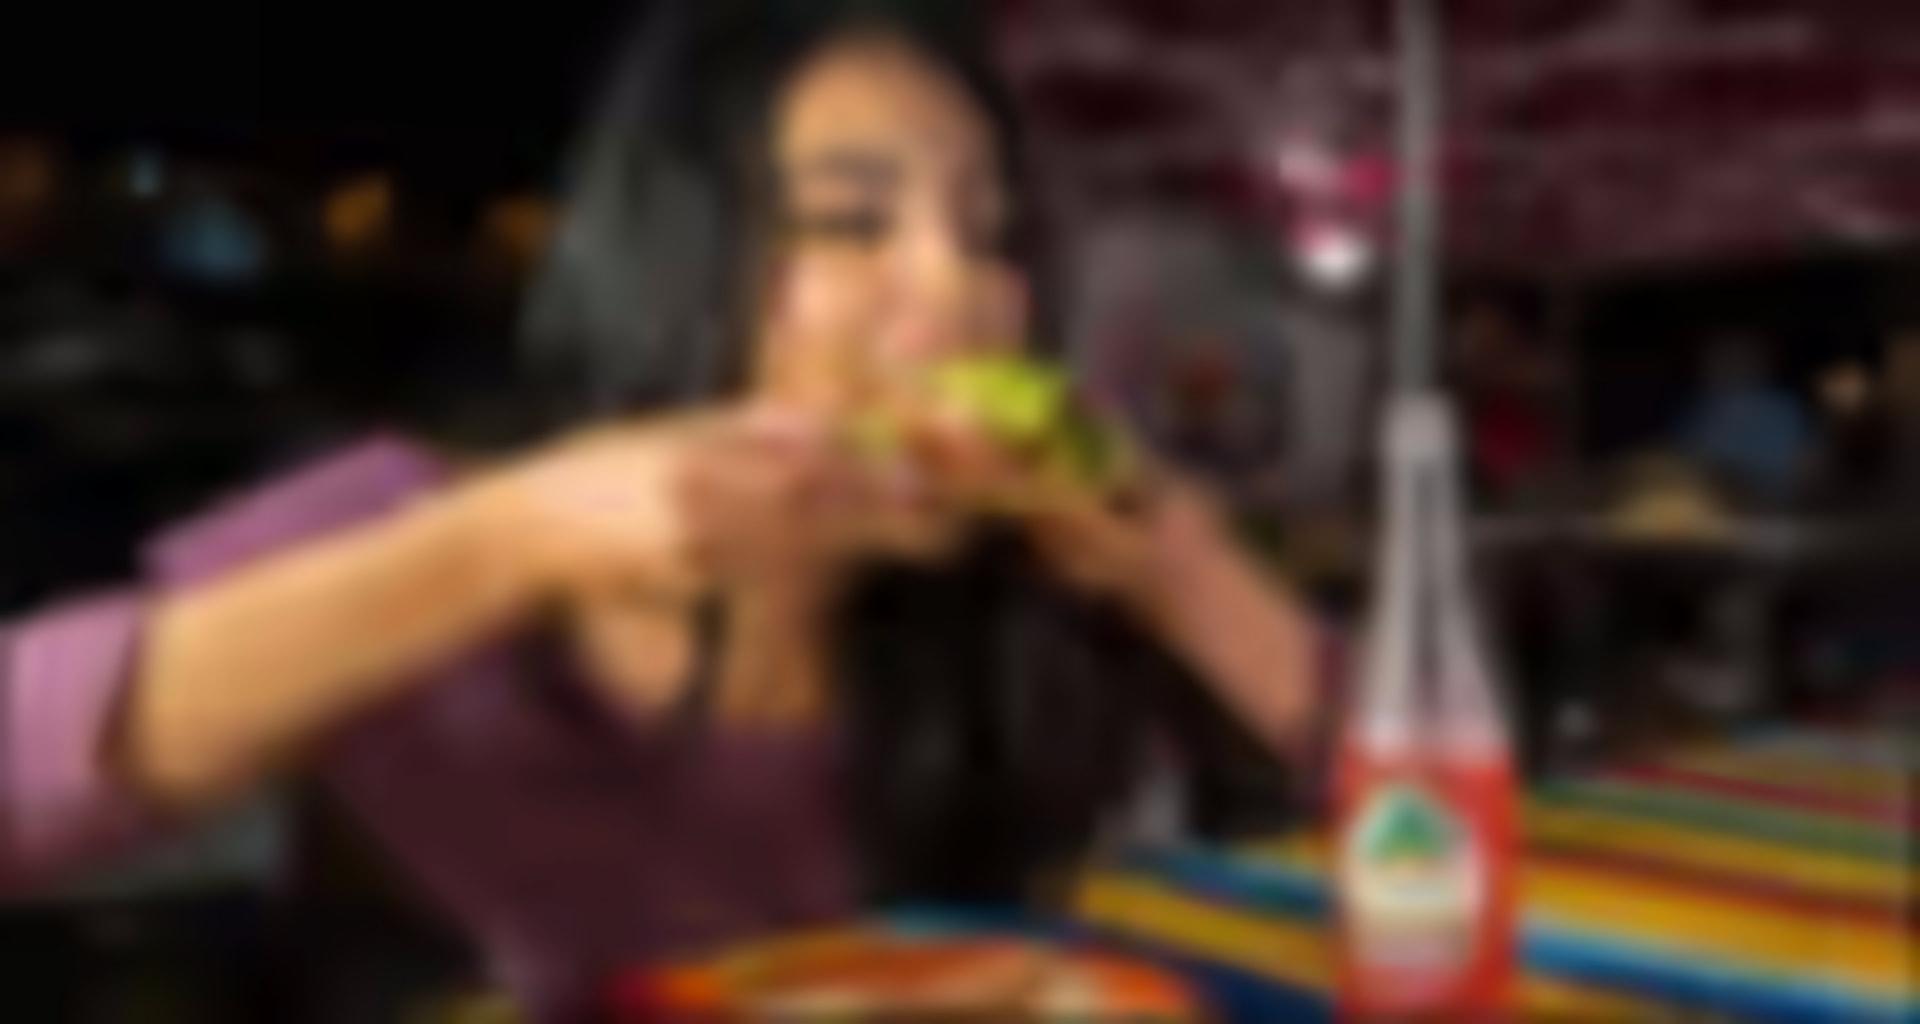 _Users_jakearchibald_Downloads_jarritos-mexican-soda-idP6ct9jkmk-unsplash png